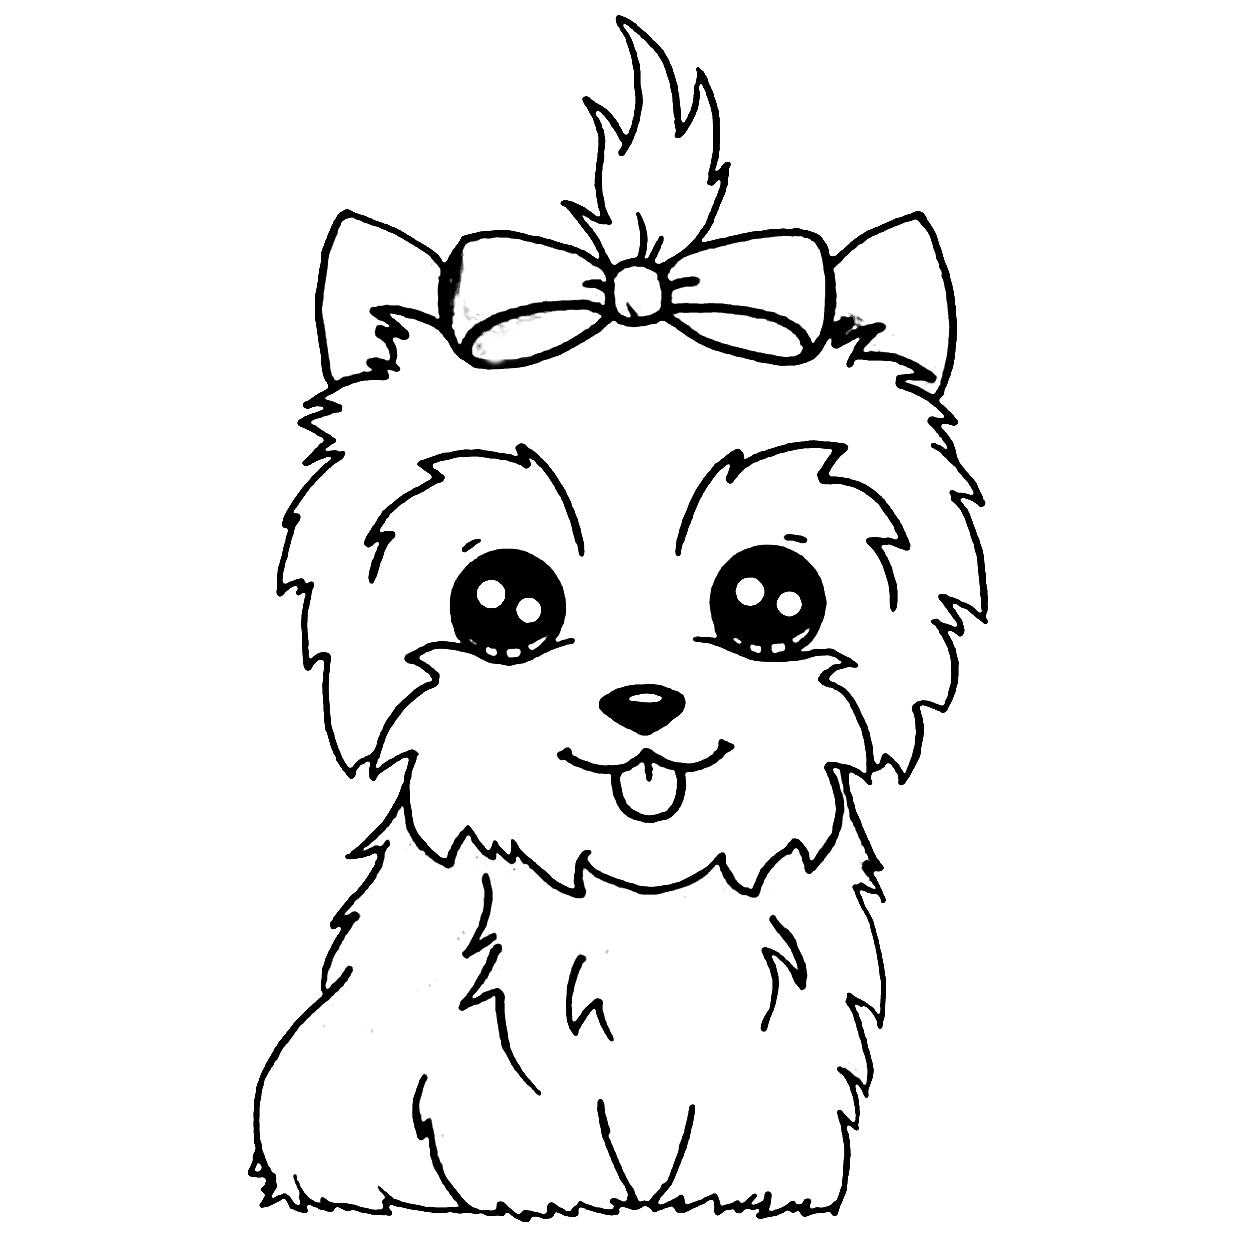 Riscos graciosos (Cute Drawings): Riscos de cães